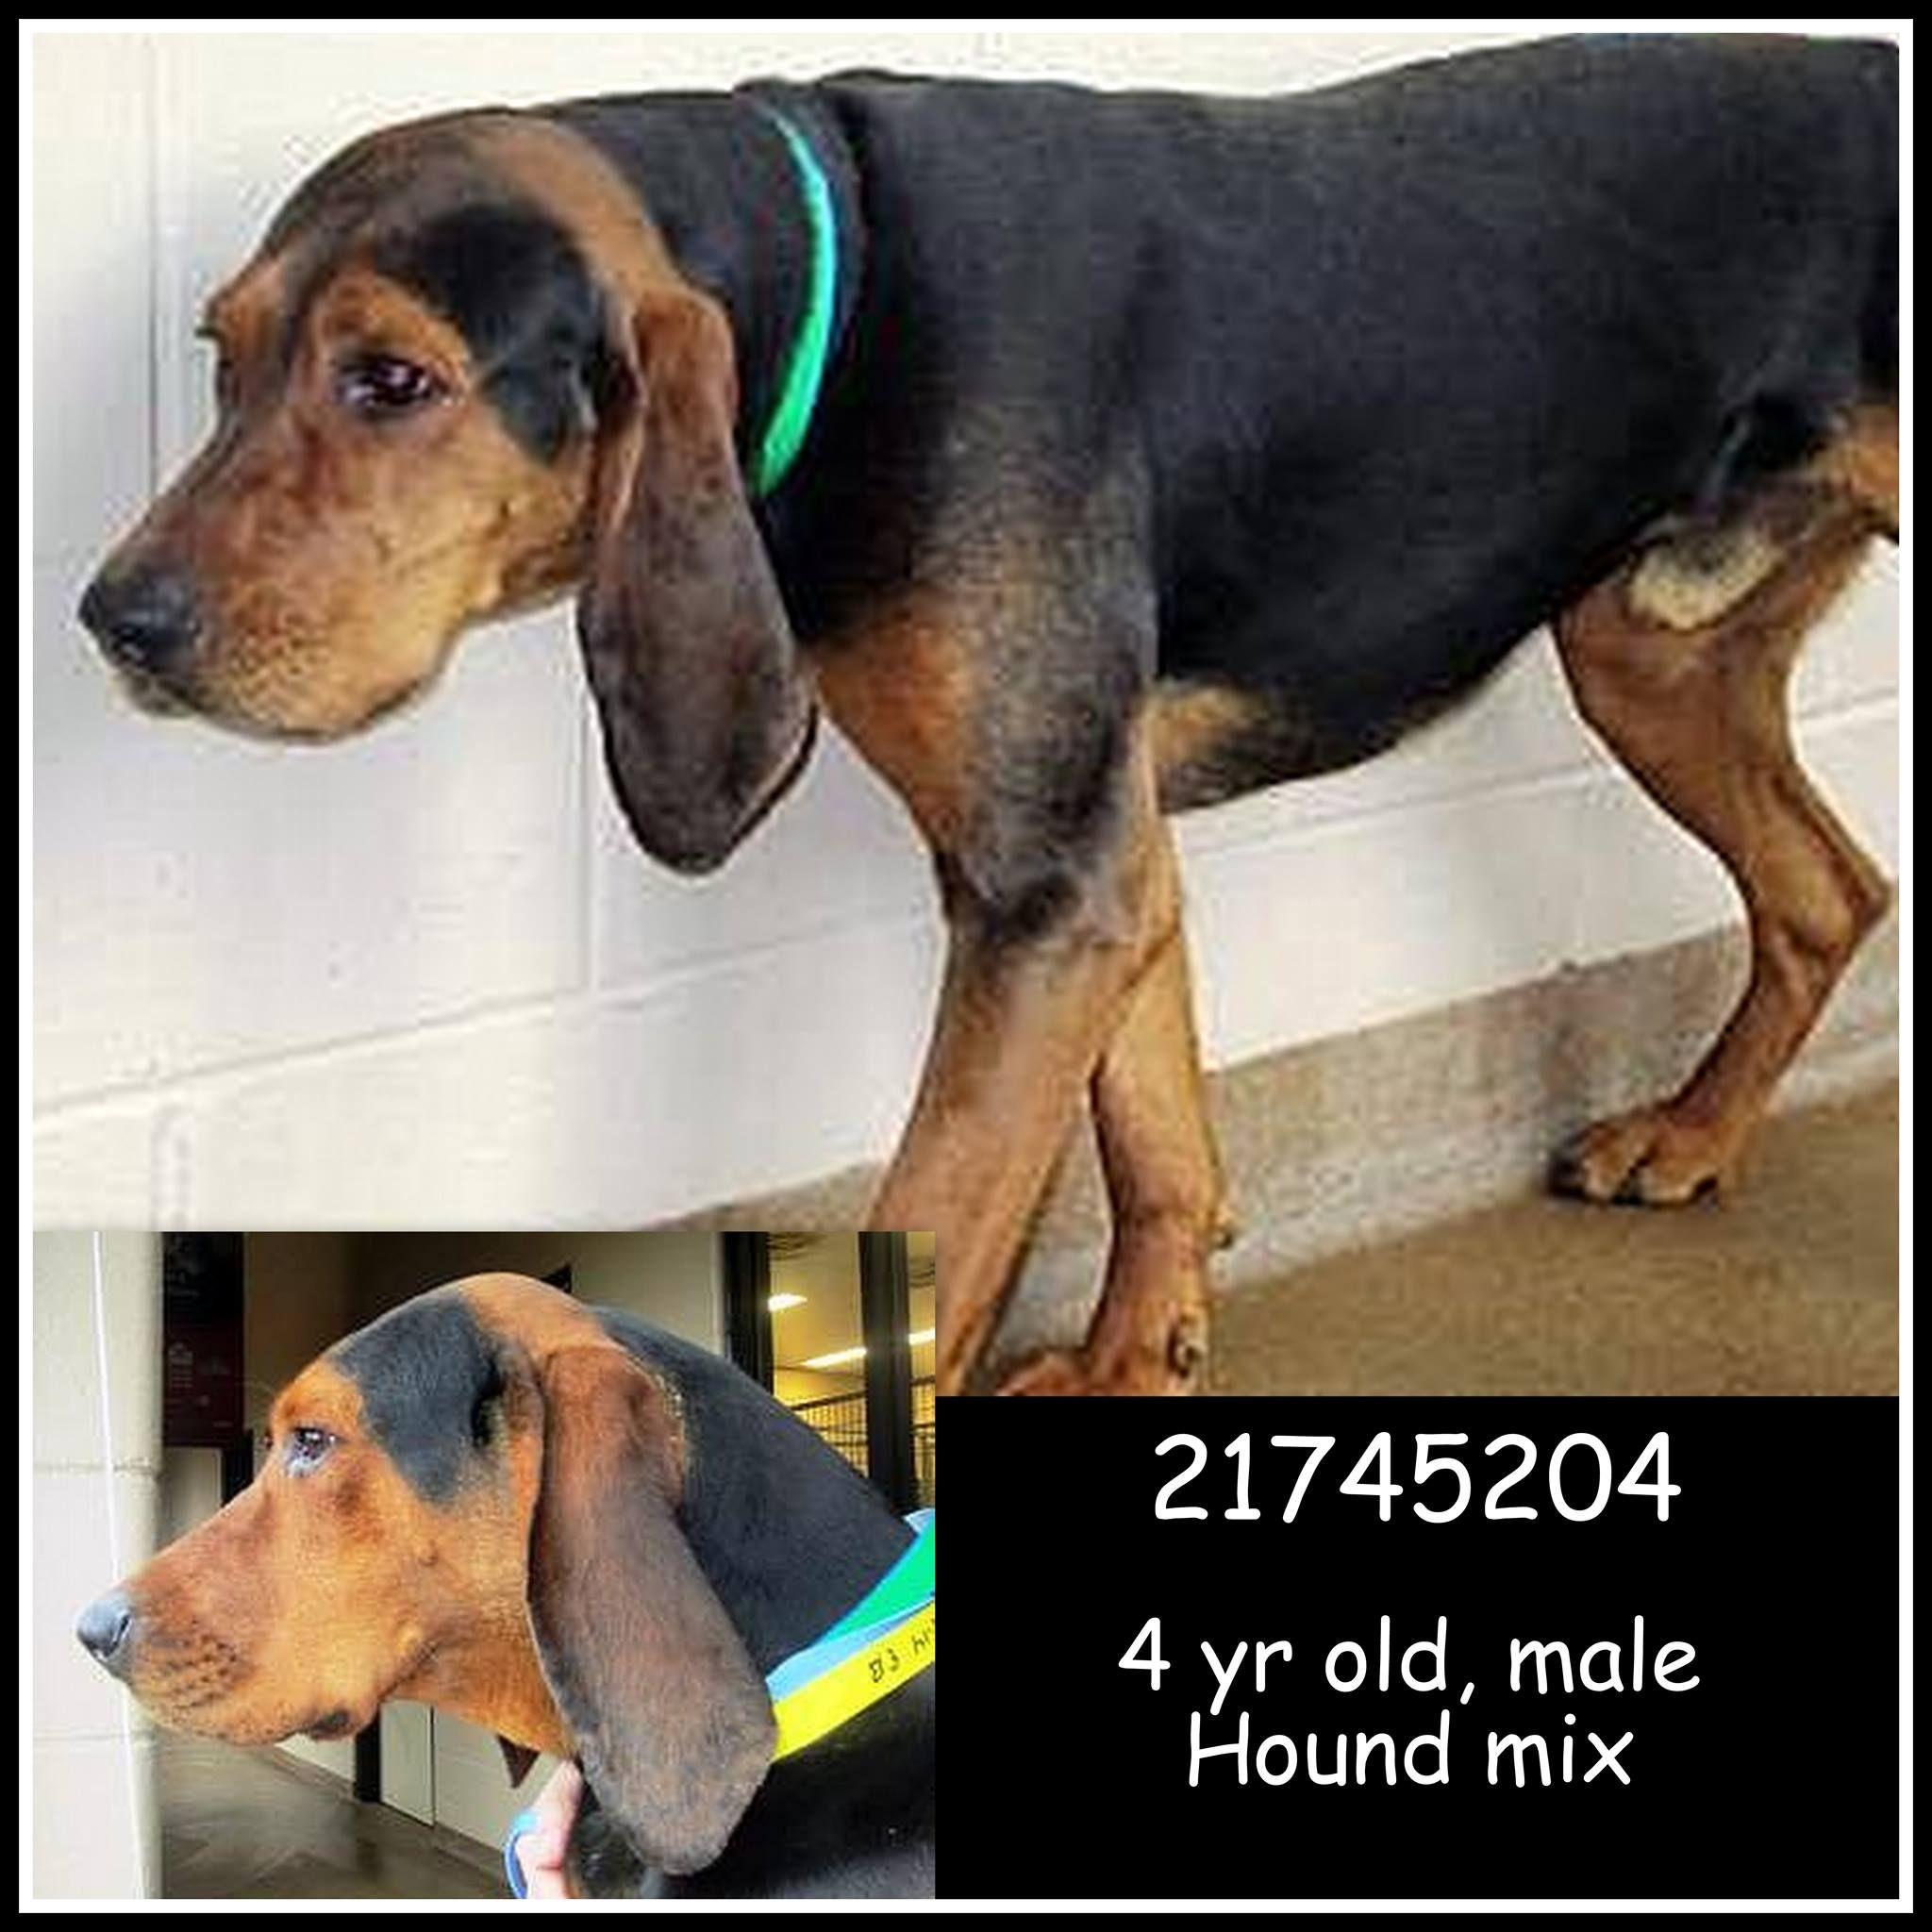 Black & Tan Coonhound M 4 years 21745204 in Gainesville